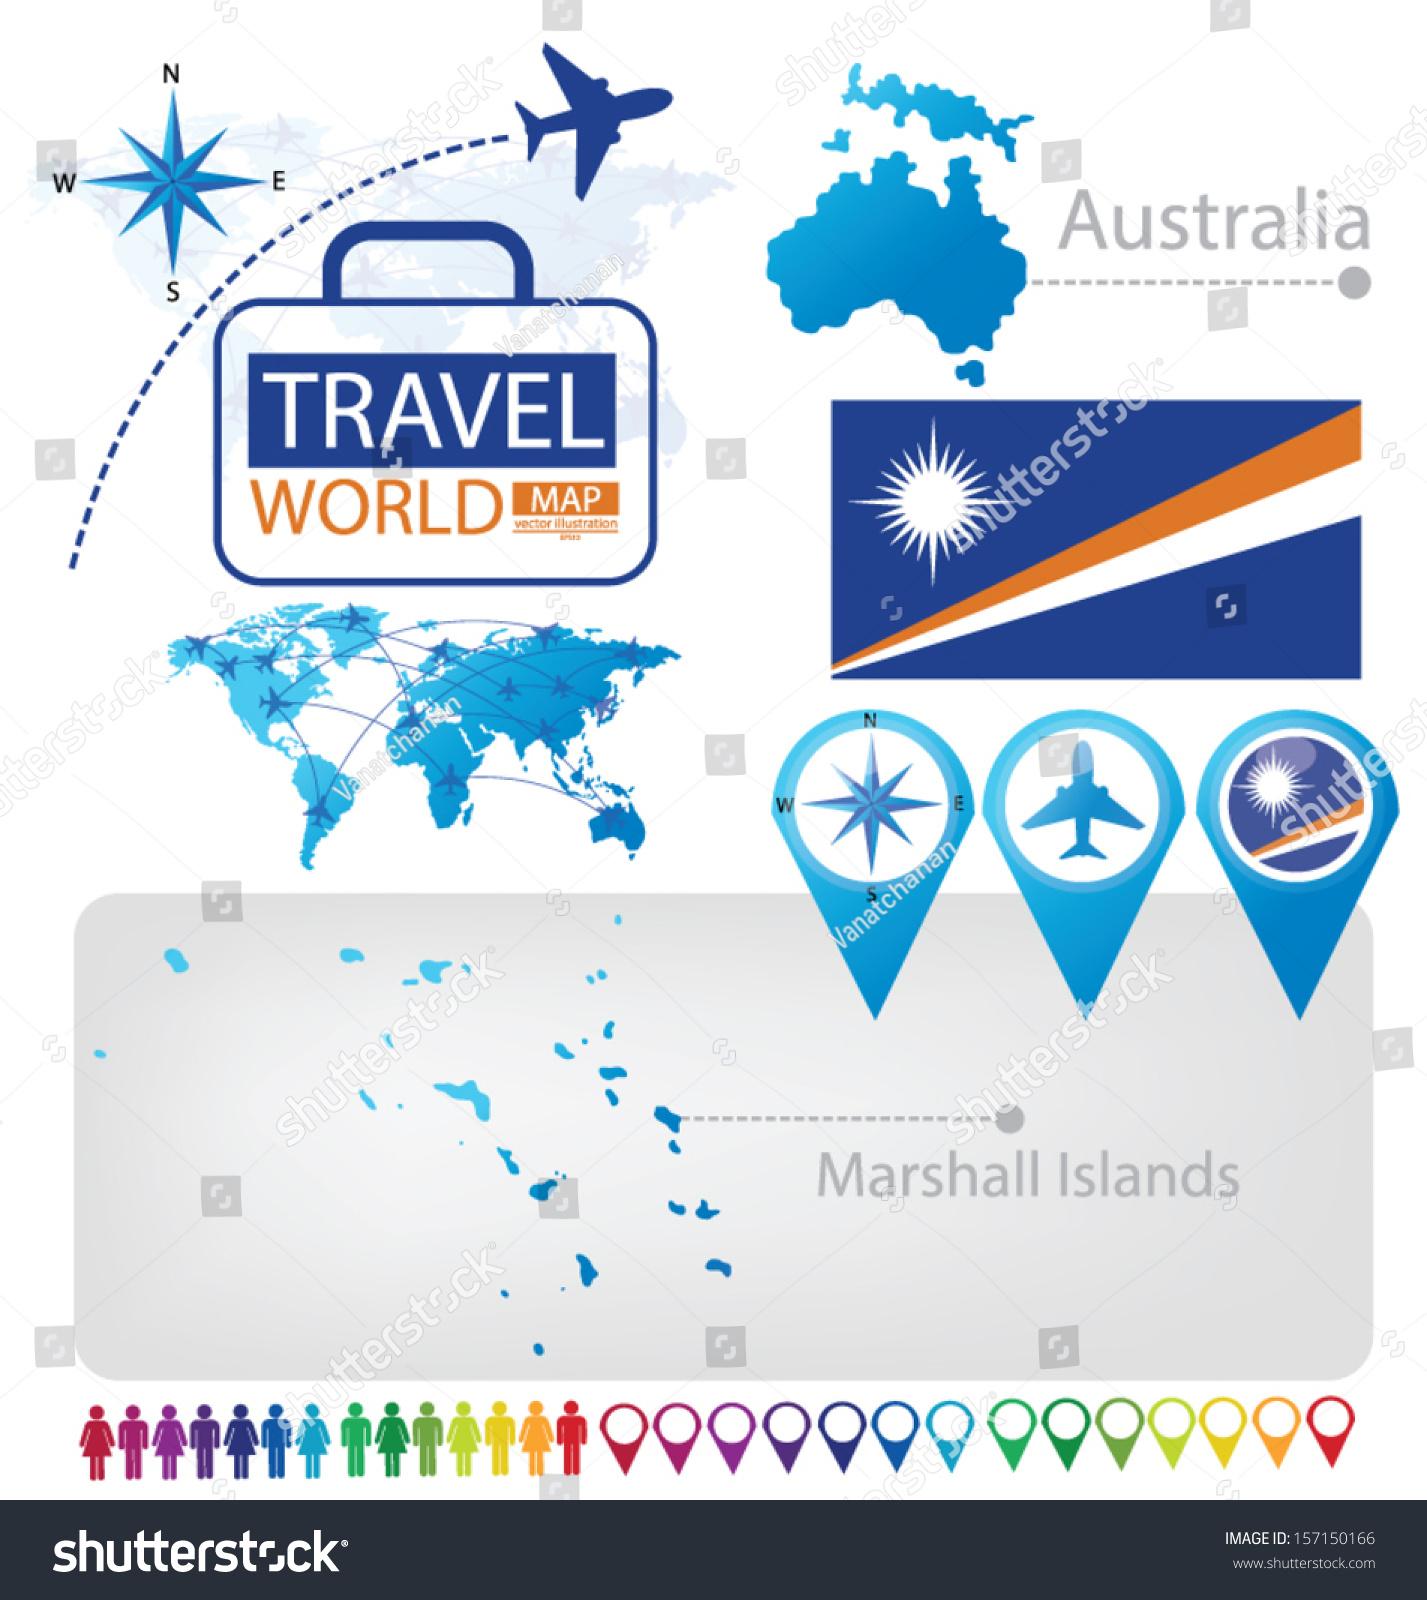 Republic Marshall Islands Australia Flag World Stock Vector (Royalty ...